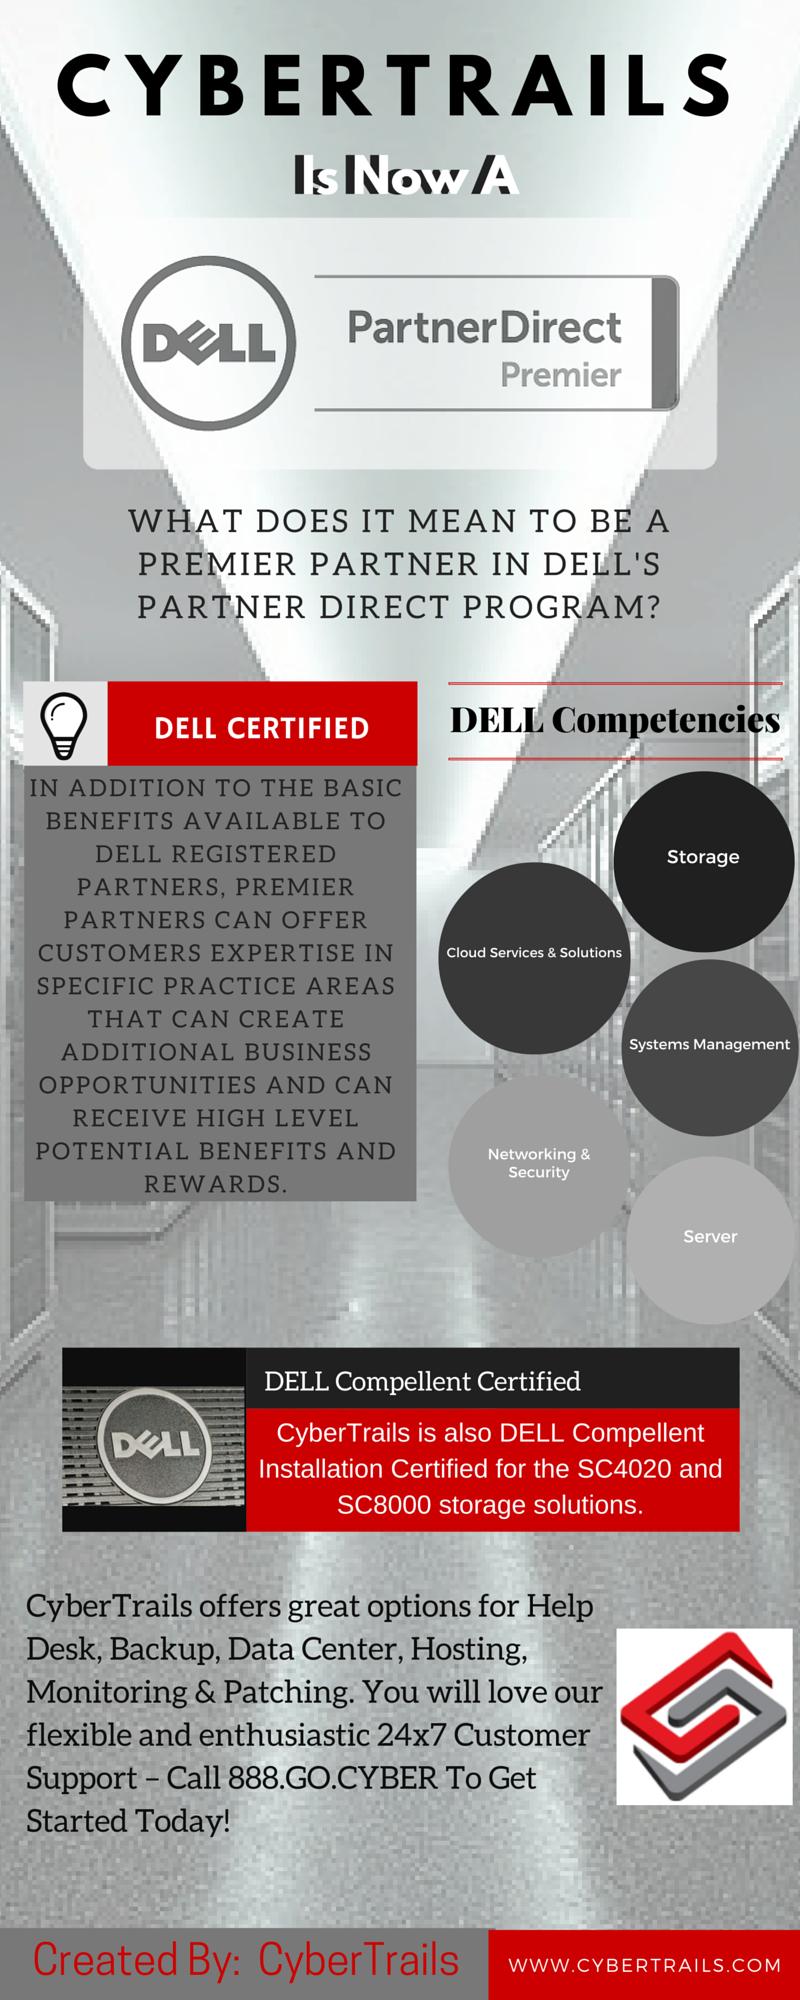 CyberTrails - DELL Partner Direct Premier Infographic | CyberTrails